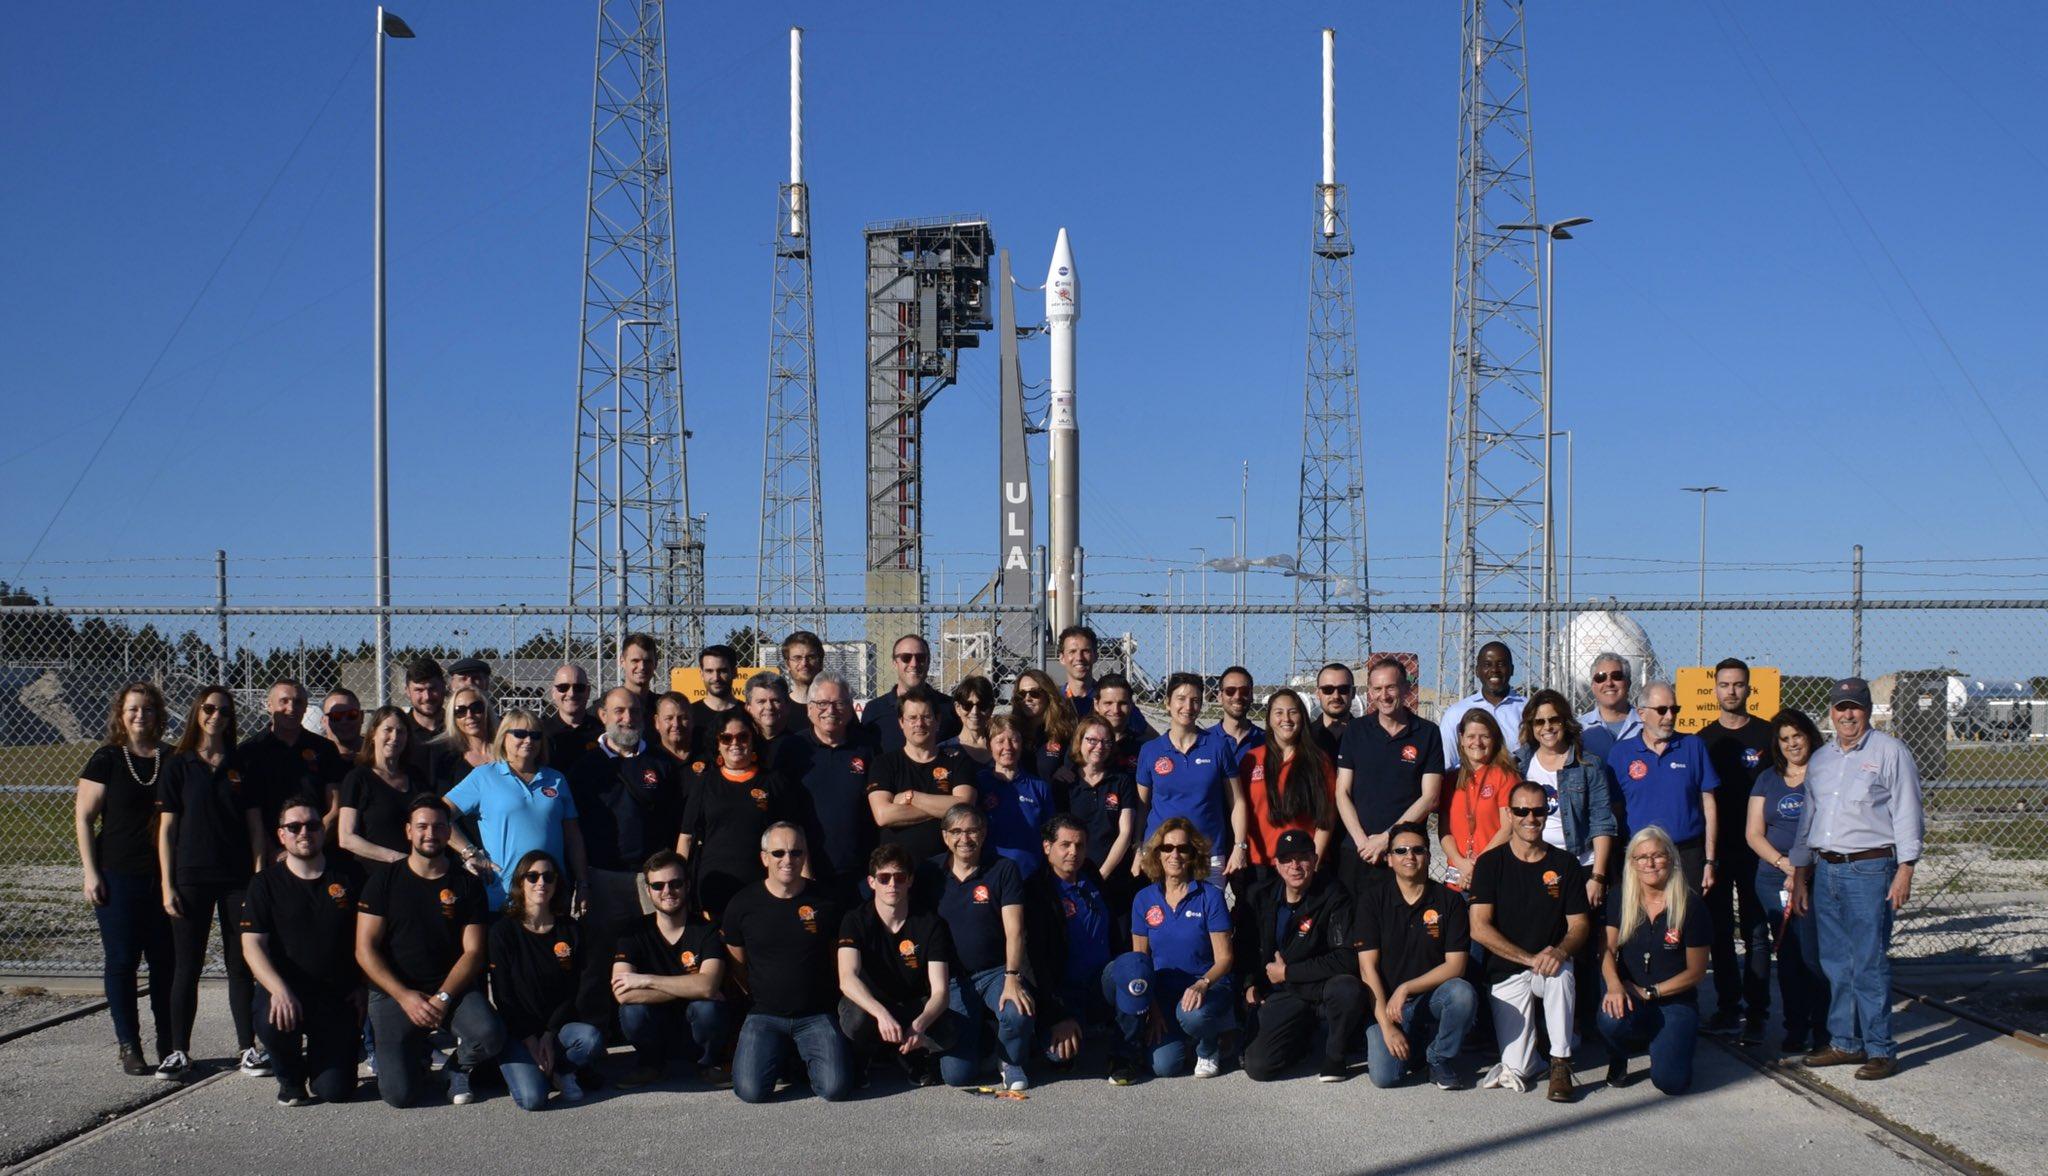 The @ESASolarOrbiter teams from @NASA @ESA and @Airbus